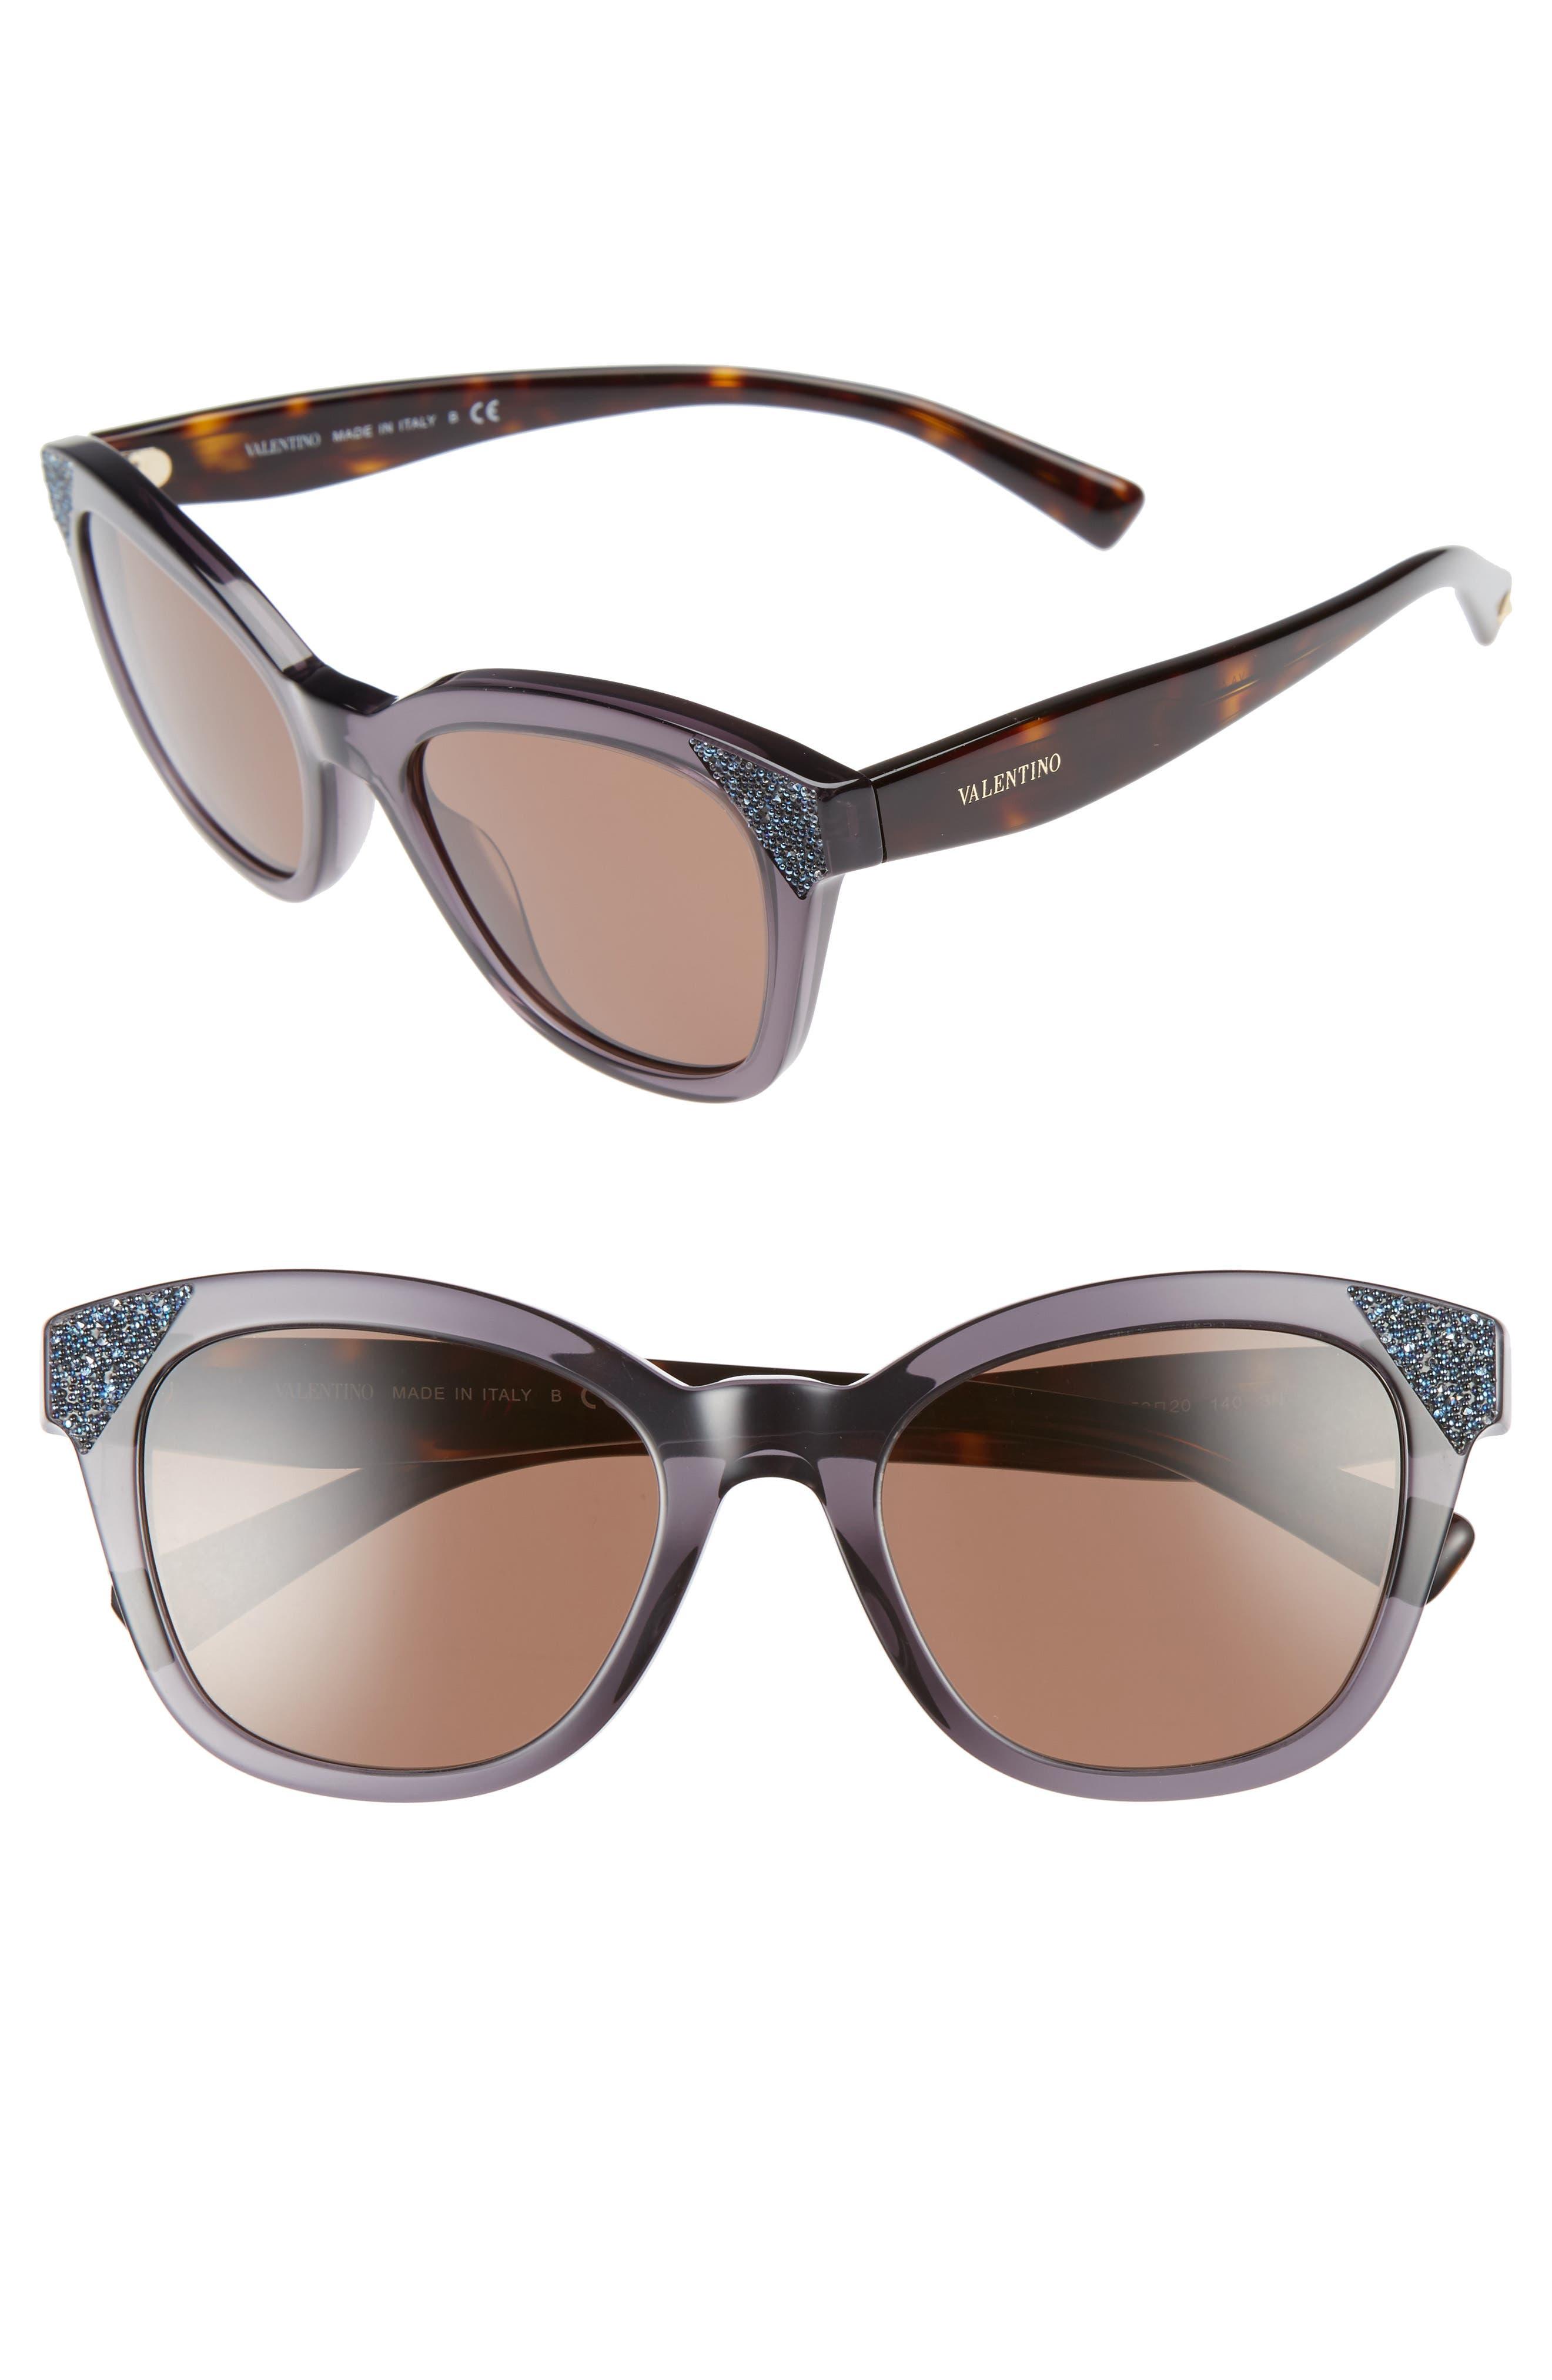 VALENTINO GARAVANI Valentino 52mm Cat Eye Sunglasses